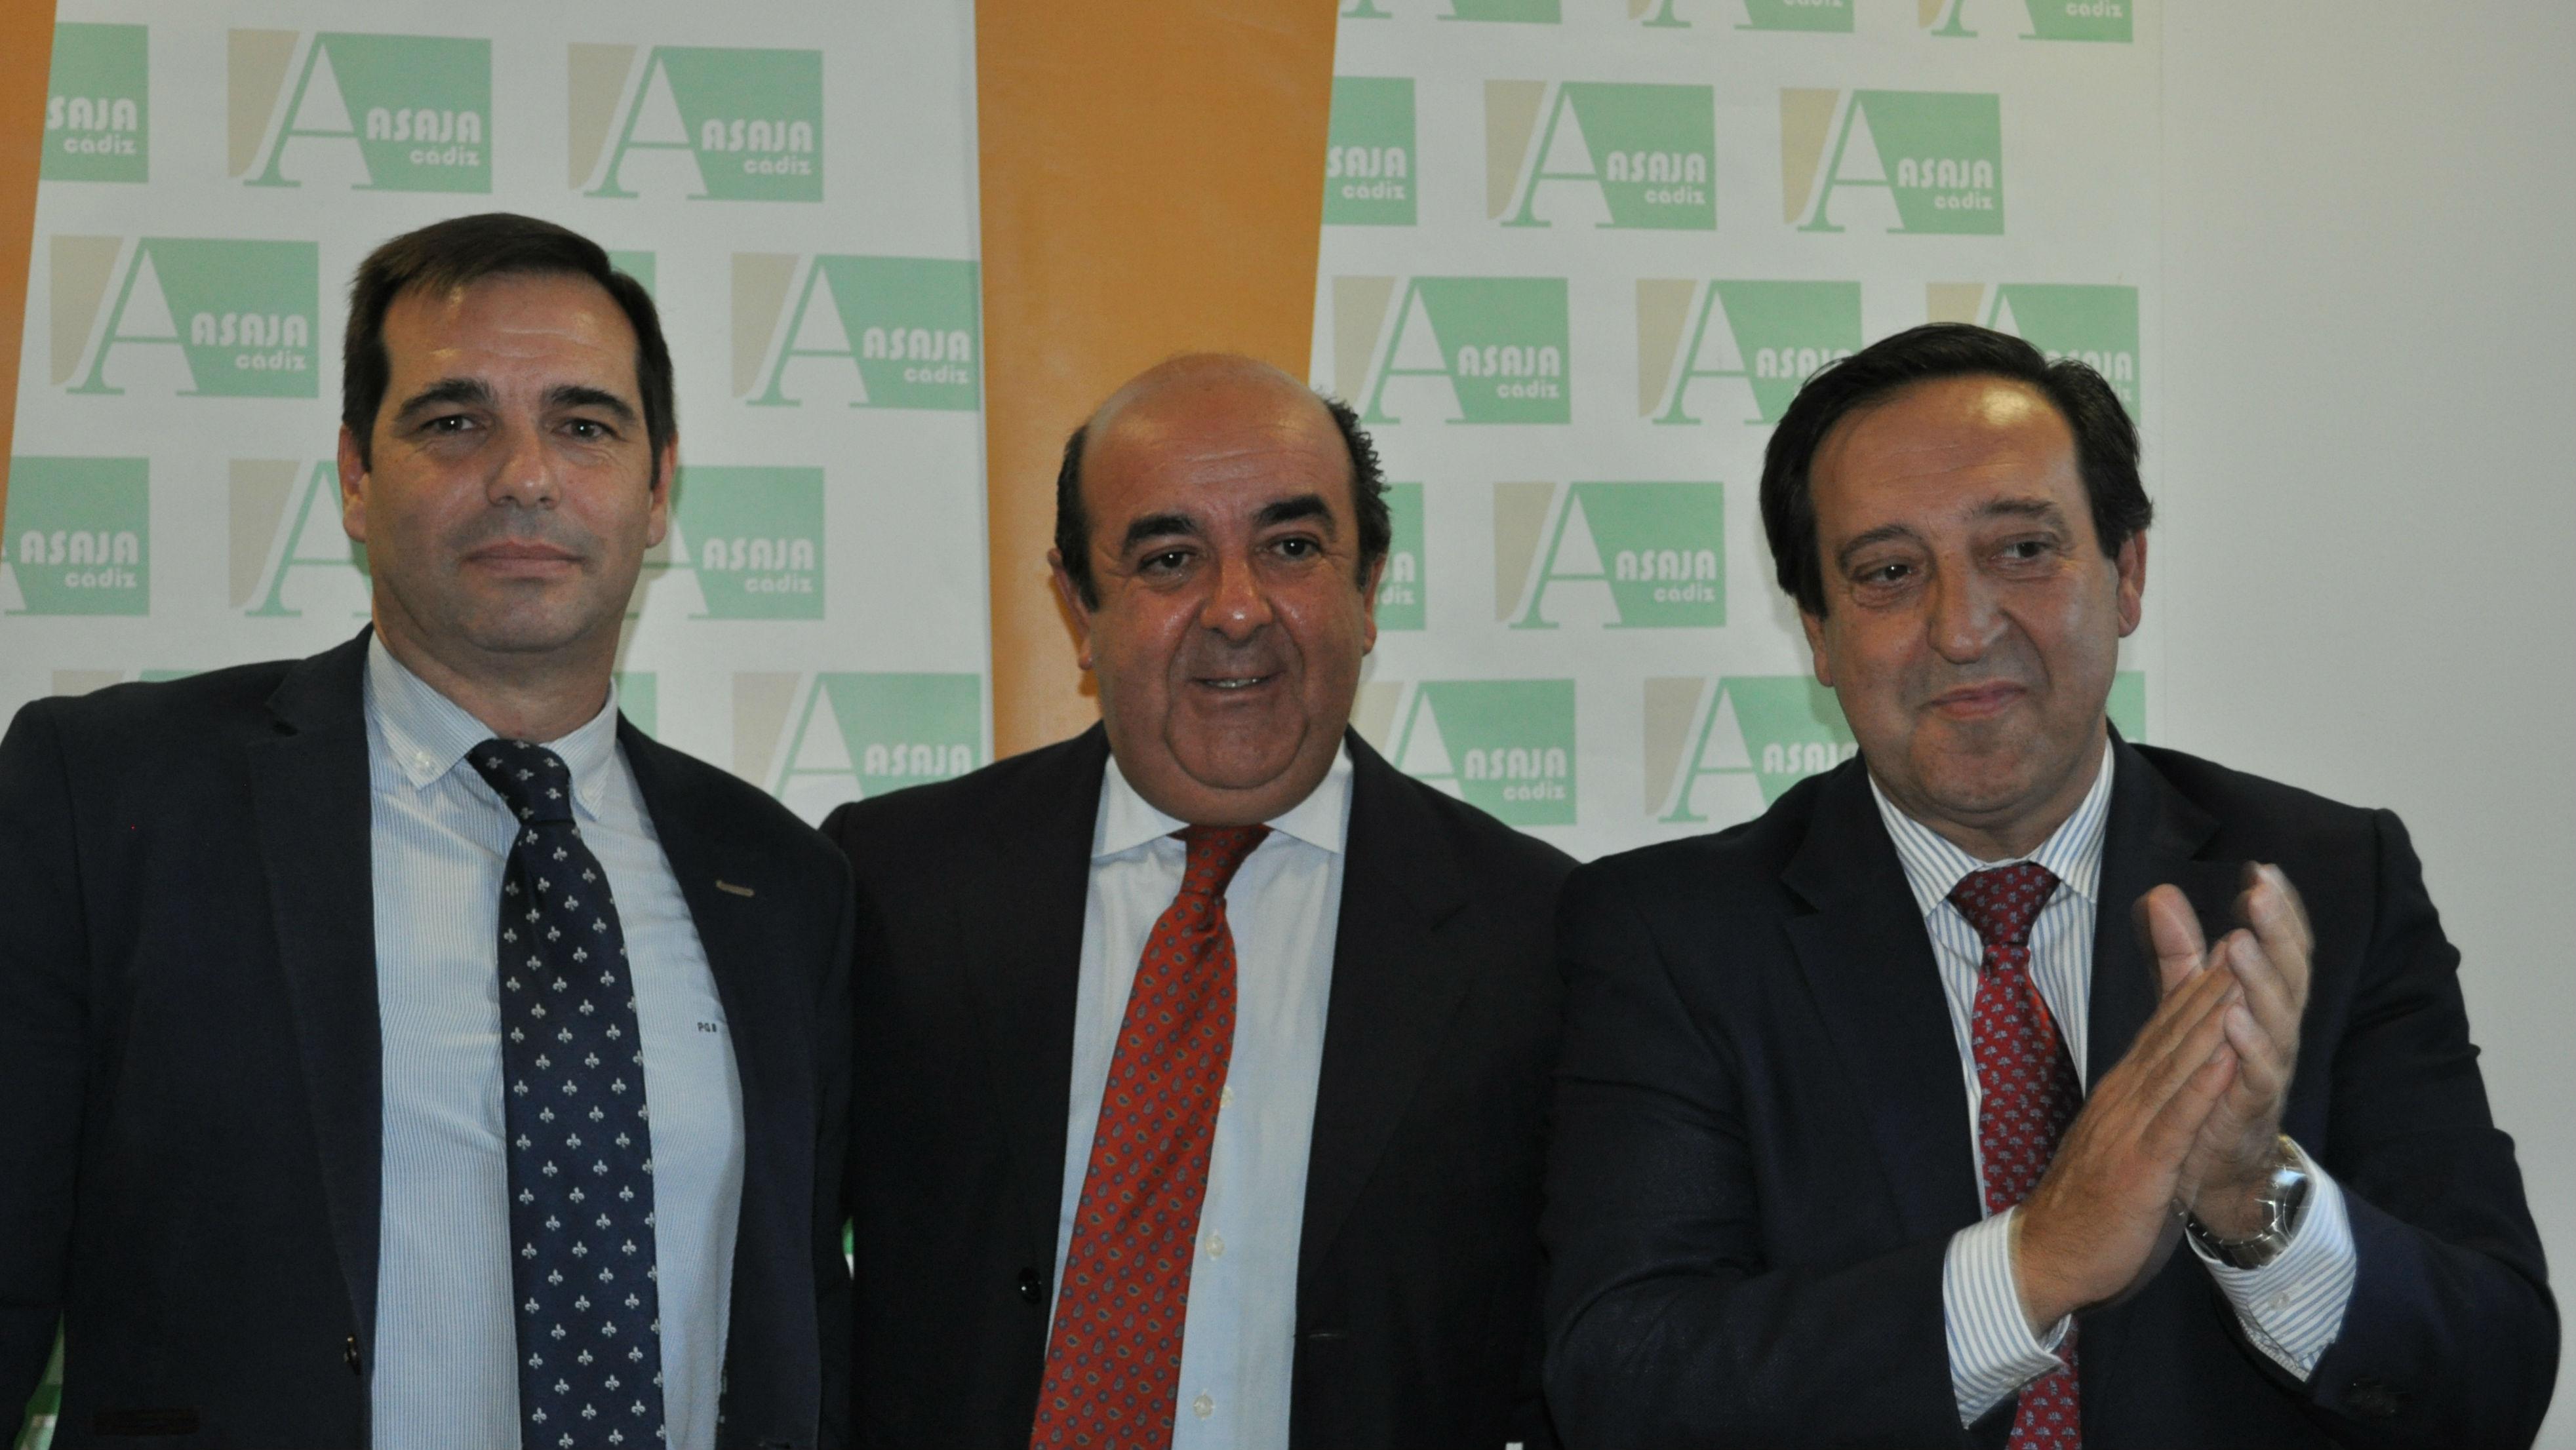 Pedro Gallardo, Manuel Vázquez y Pedro Barato posan tras el relevo en Asaja-Cádiz